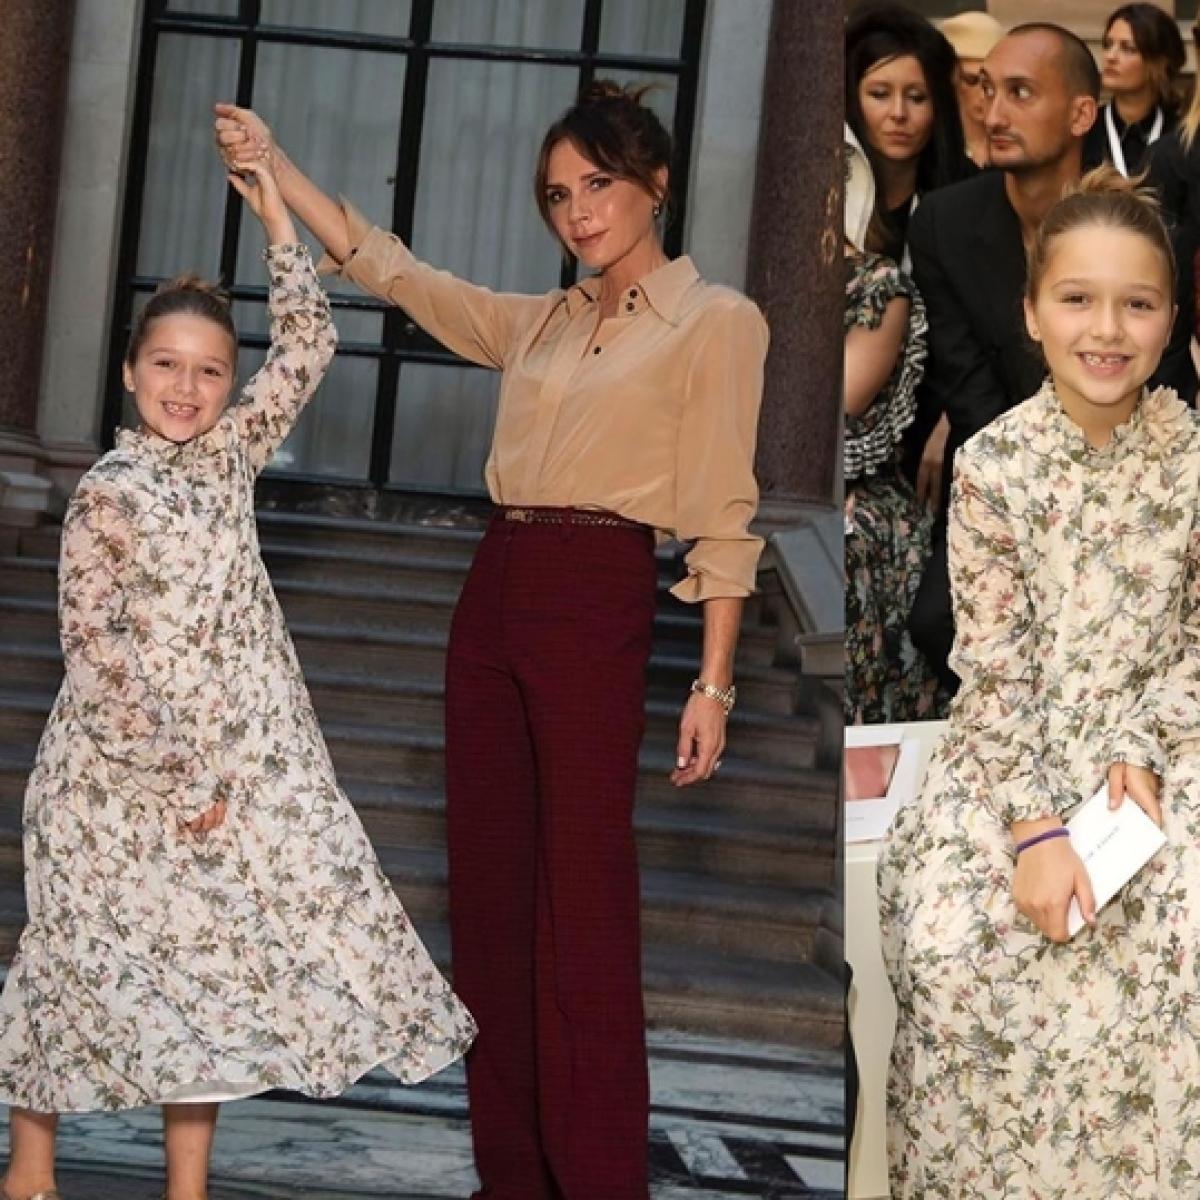 Victoria Beckham's daughter Harper steals the show at London Fashion Week